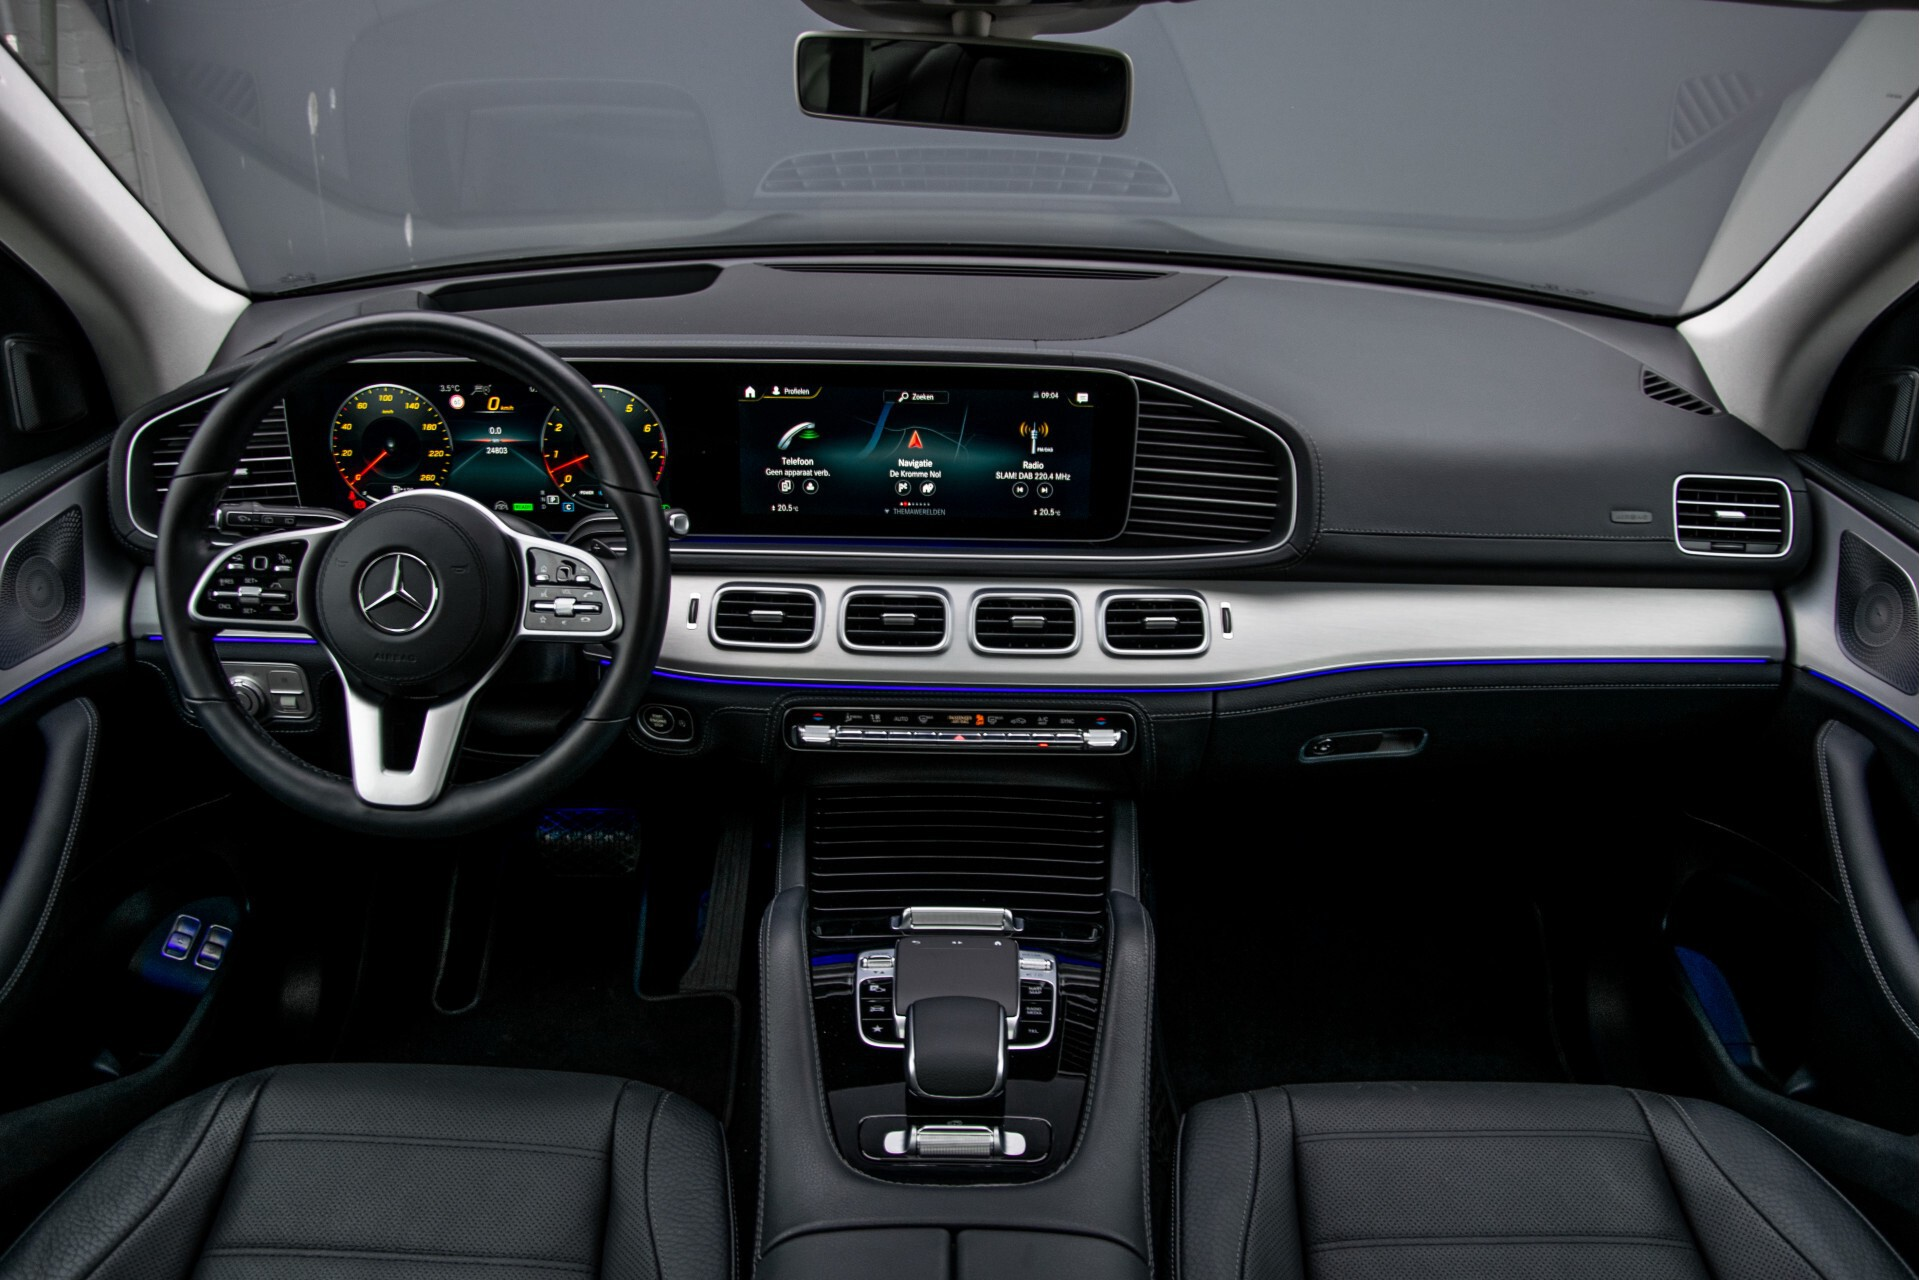 Mercedes-Benz GLE 450 4-M 7-Persoons AMG Massage/Rij-assist/Keyless/TV/360/Night/Trekhaak Aut9 Foto 10